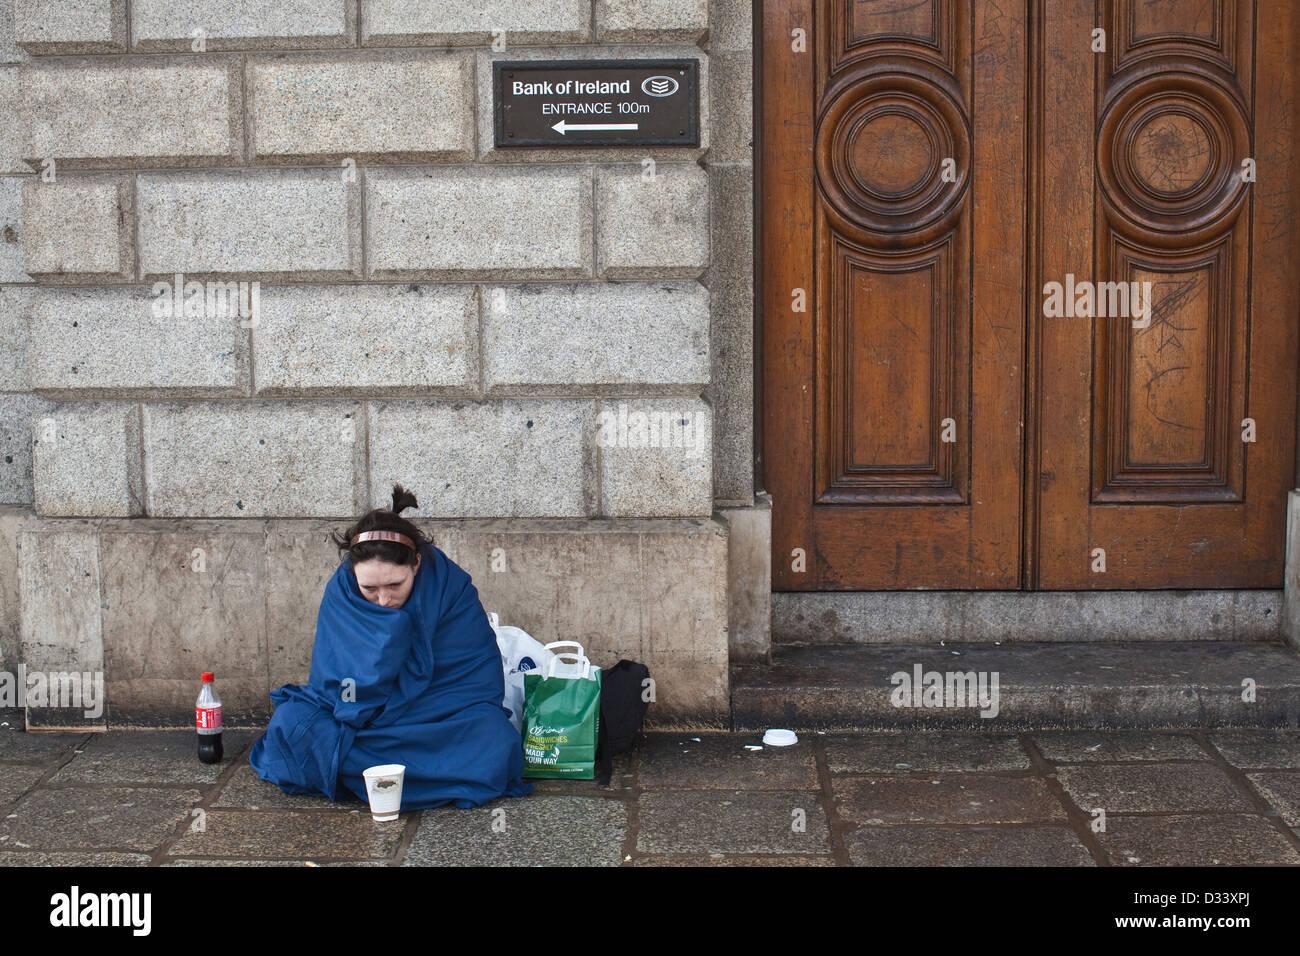 Homeless woman begging on the doorstep of the Bank of Ireland, Westmoreland Street, Dublin, Ireland. - Stock Image